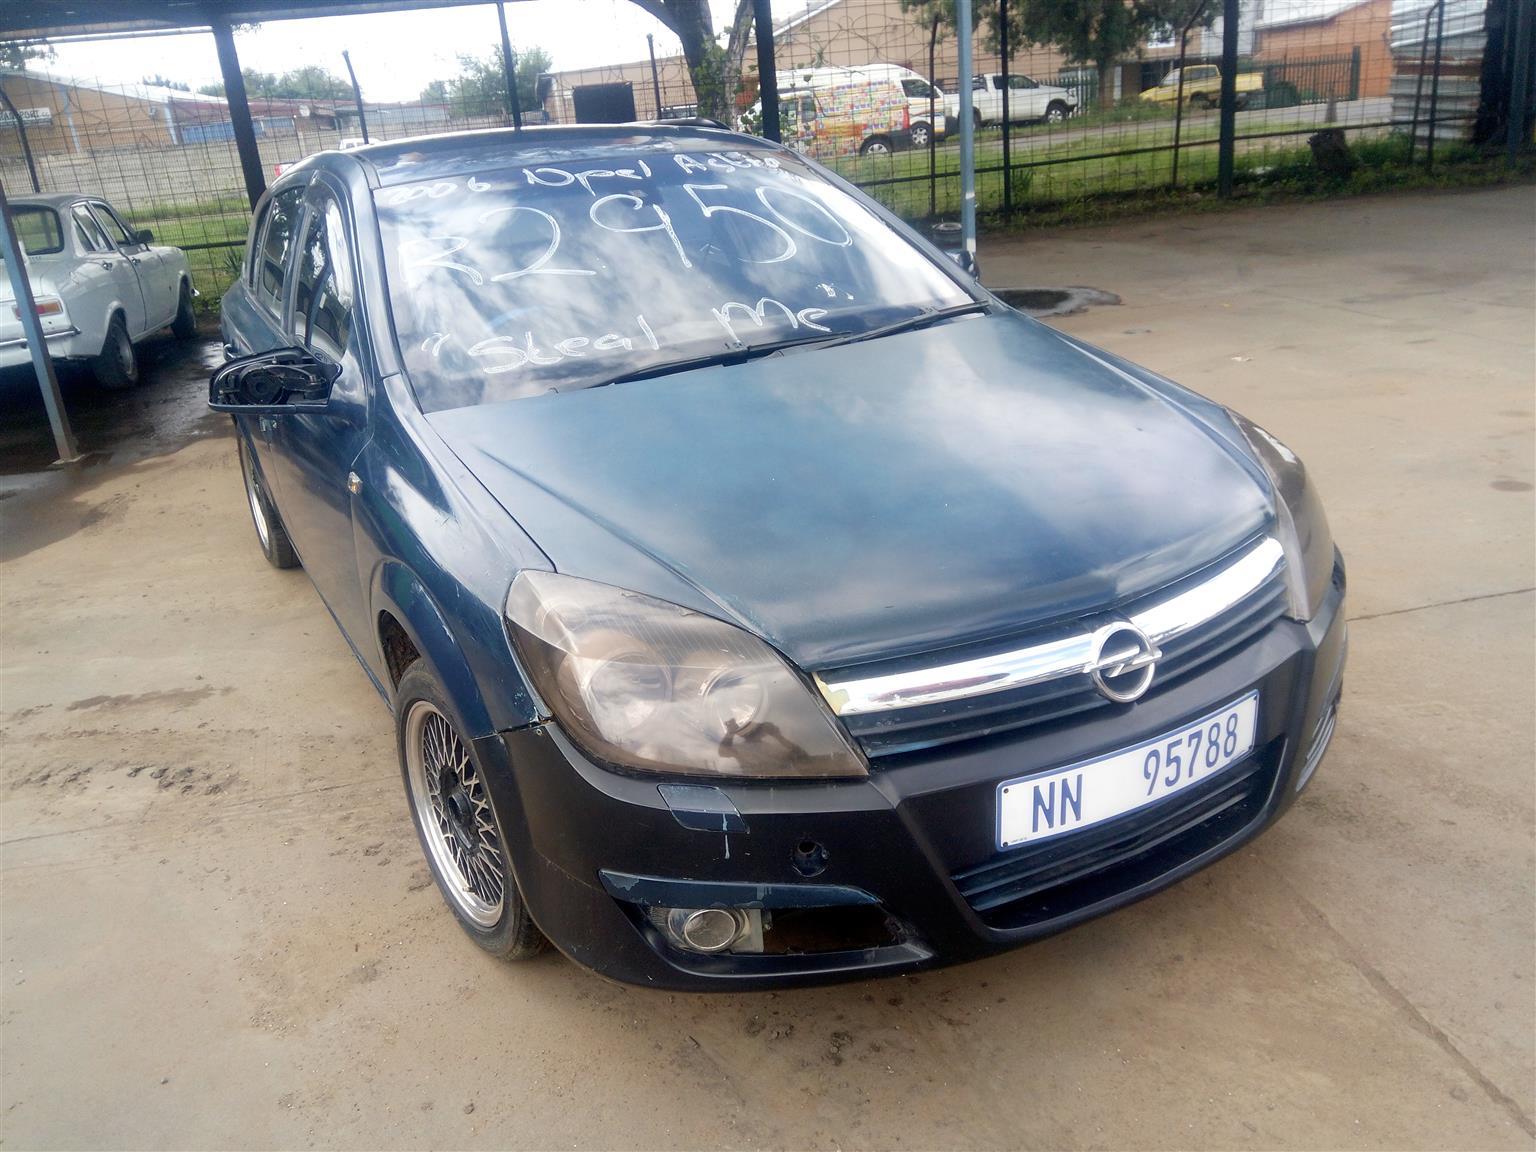 2006 Opel Astra 1.6 Enjoy